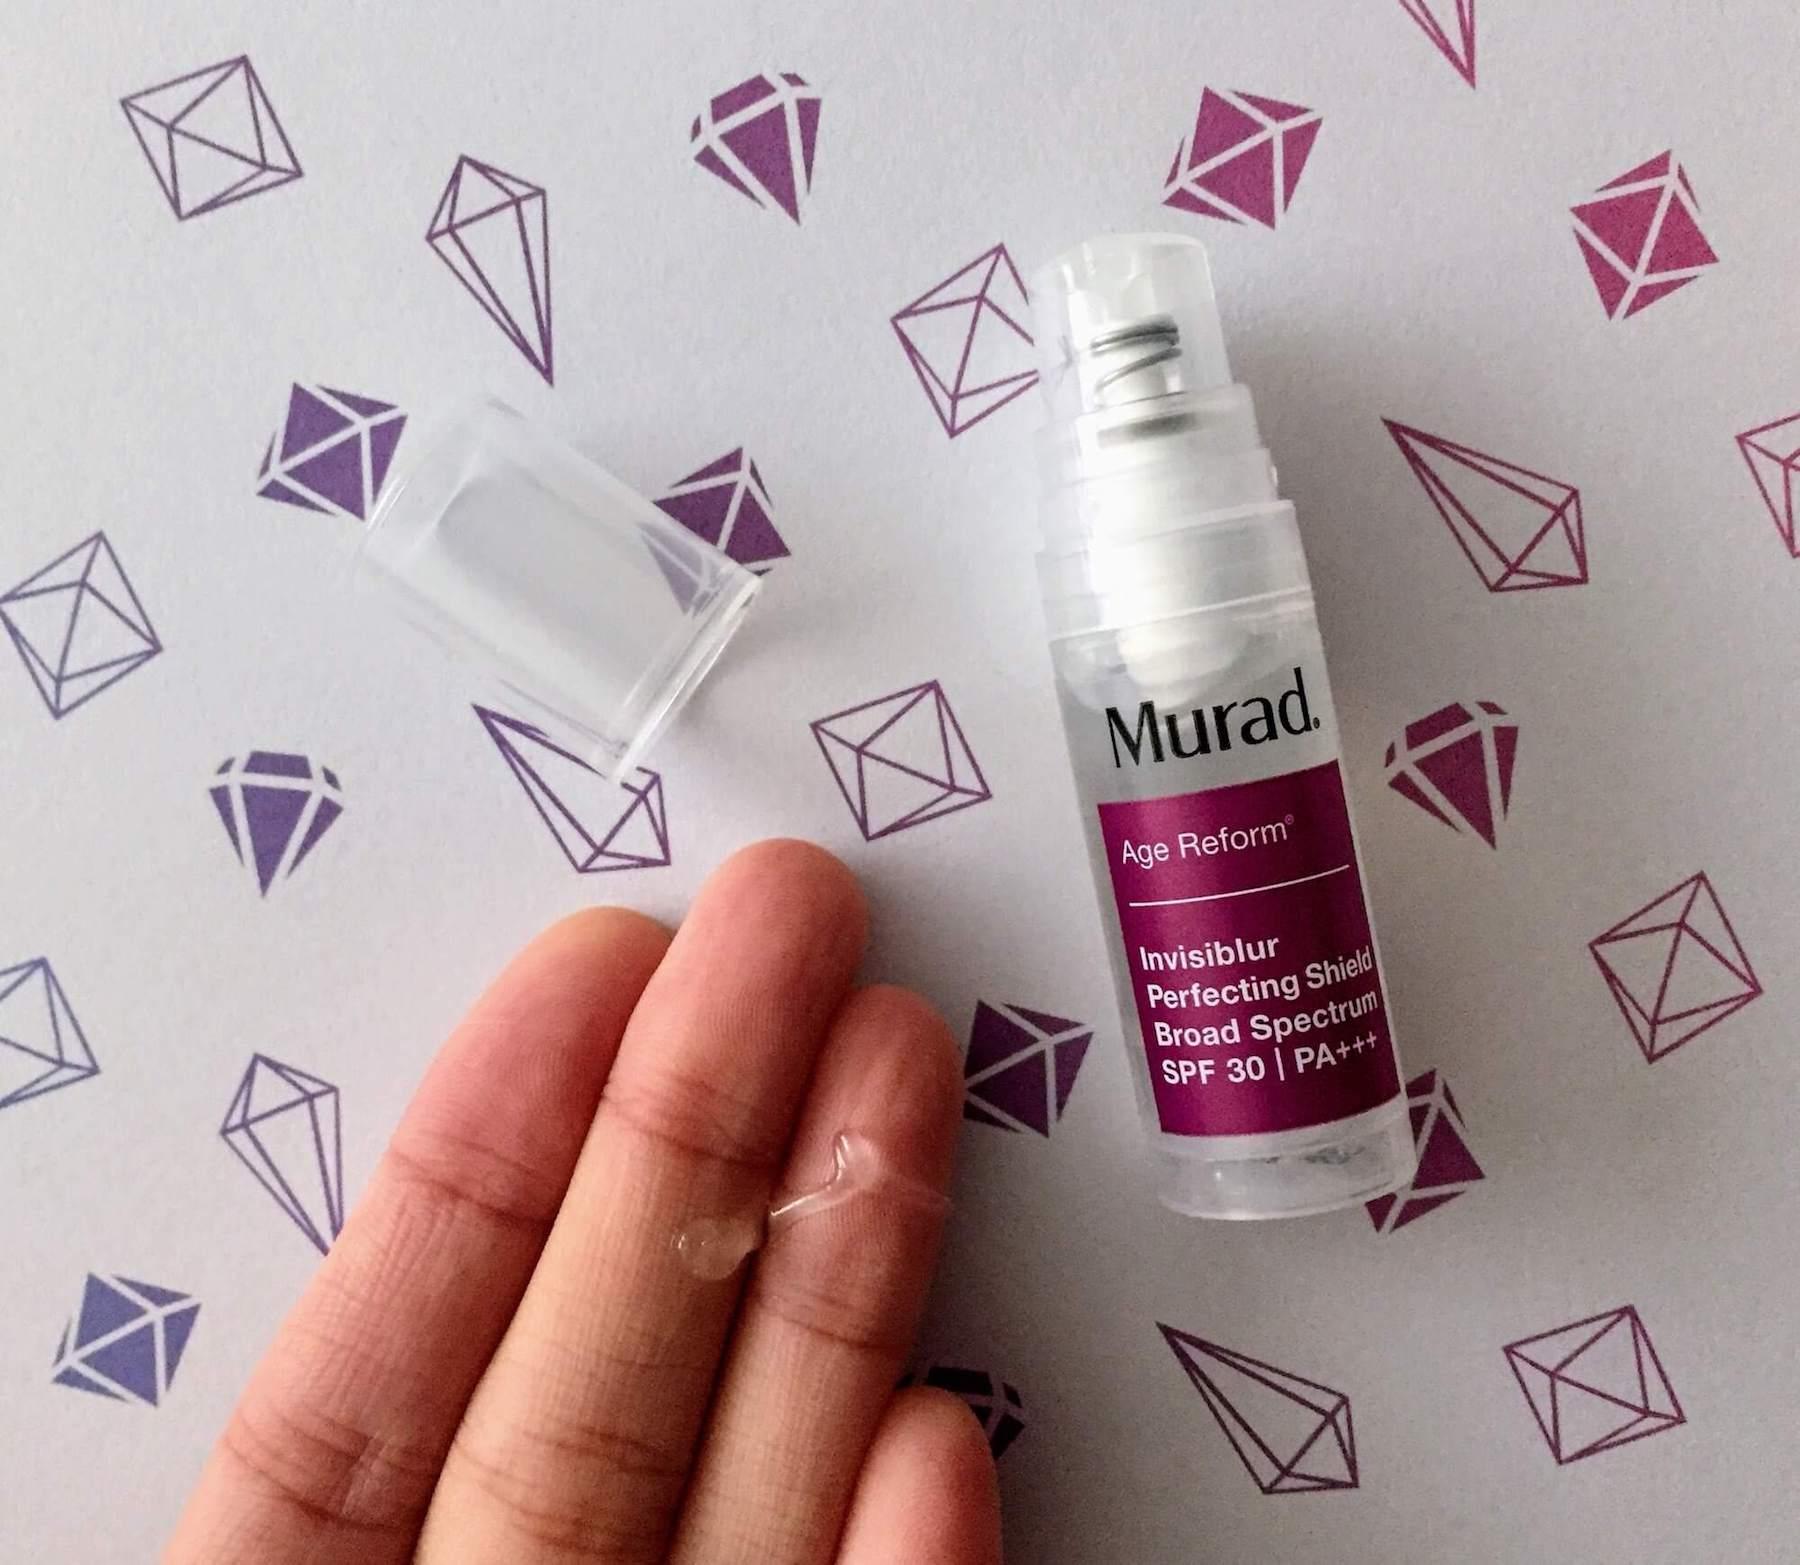 Murad Invisiblur Perfecting Shield SPF 30 Sunscreen review